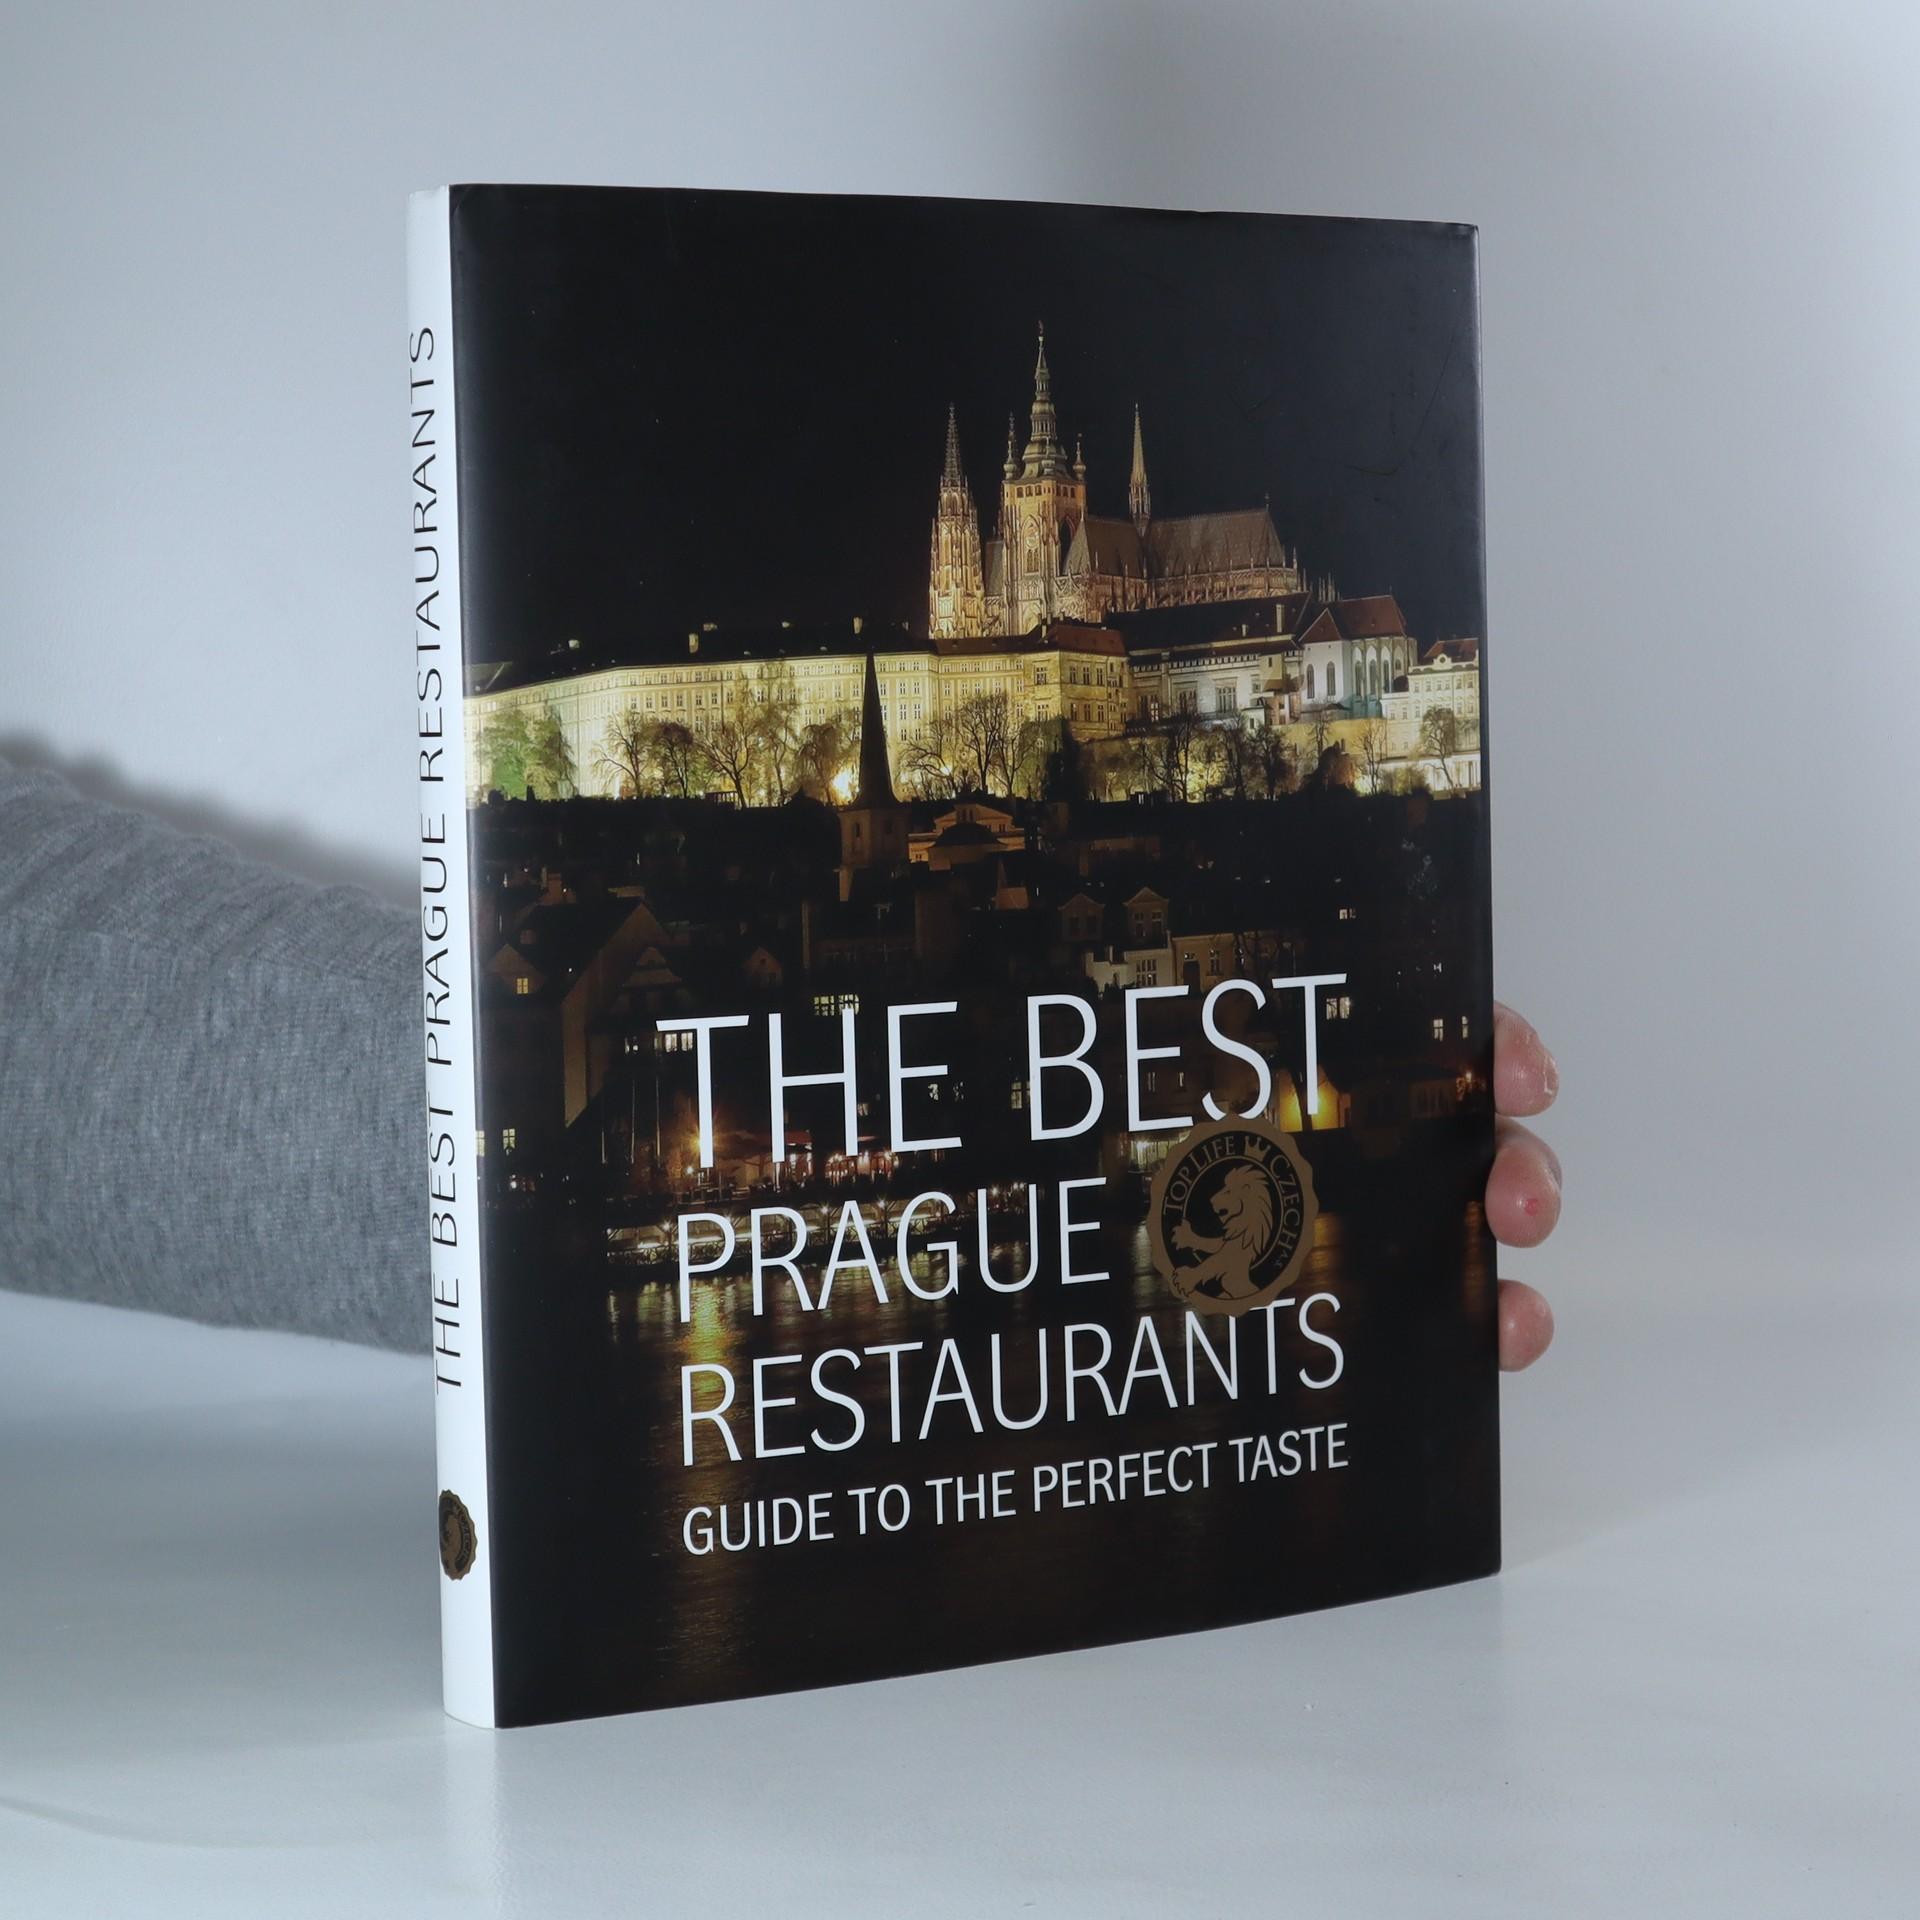 antikvární kniha The best Prague restaurants. Guide to the perfect taste, 2015